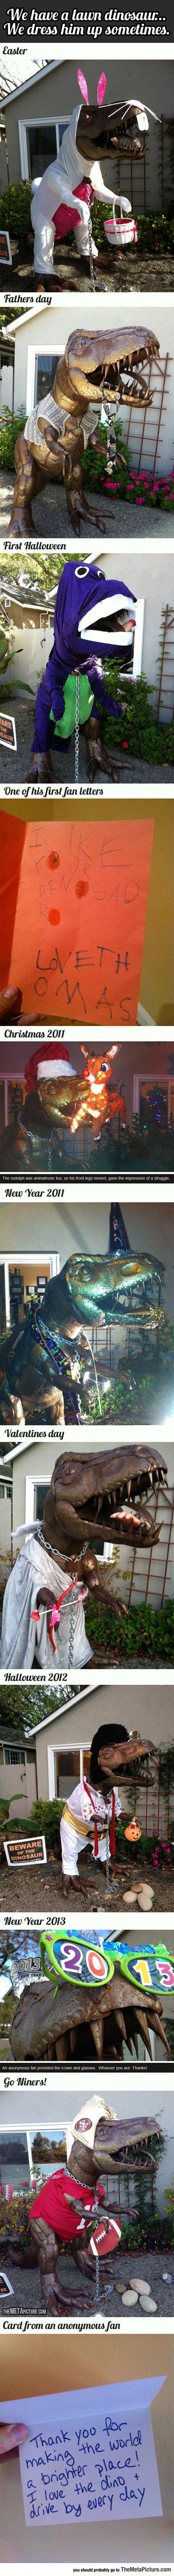 cool-dinosaur-sculpture-garden-costumes